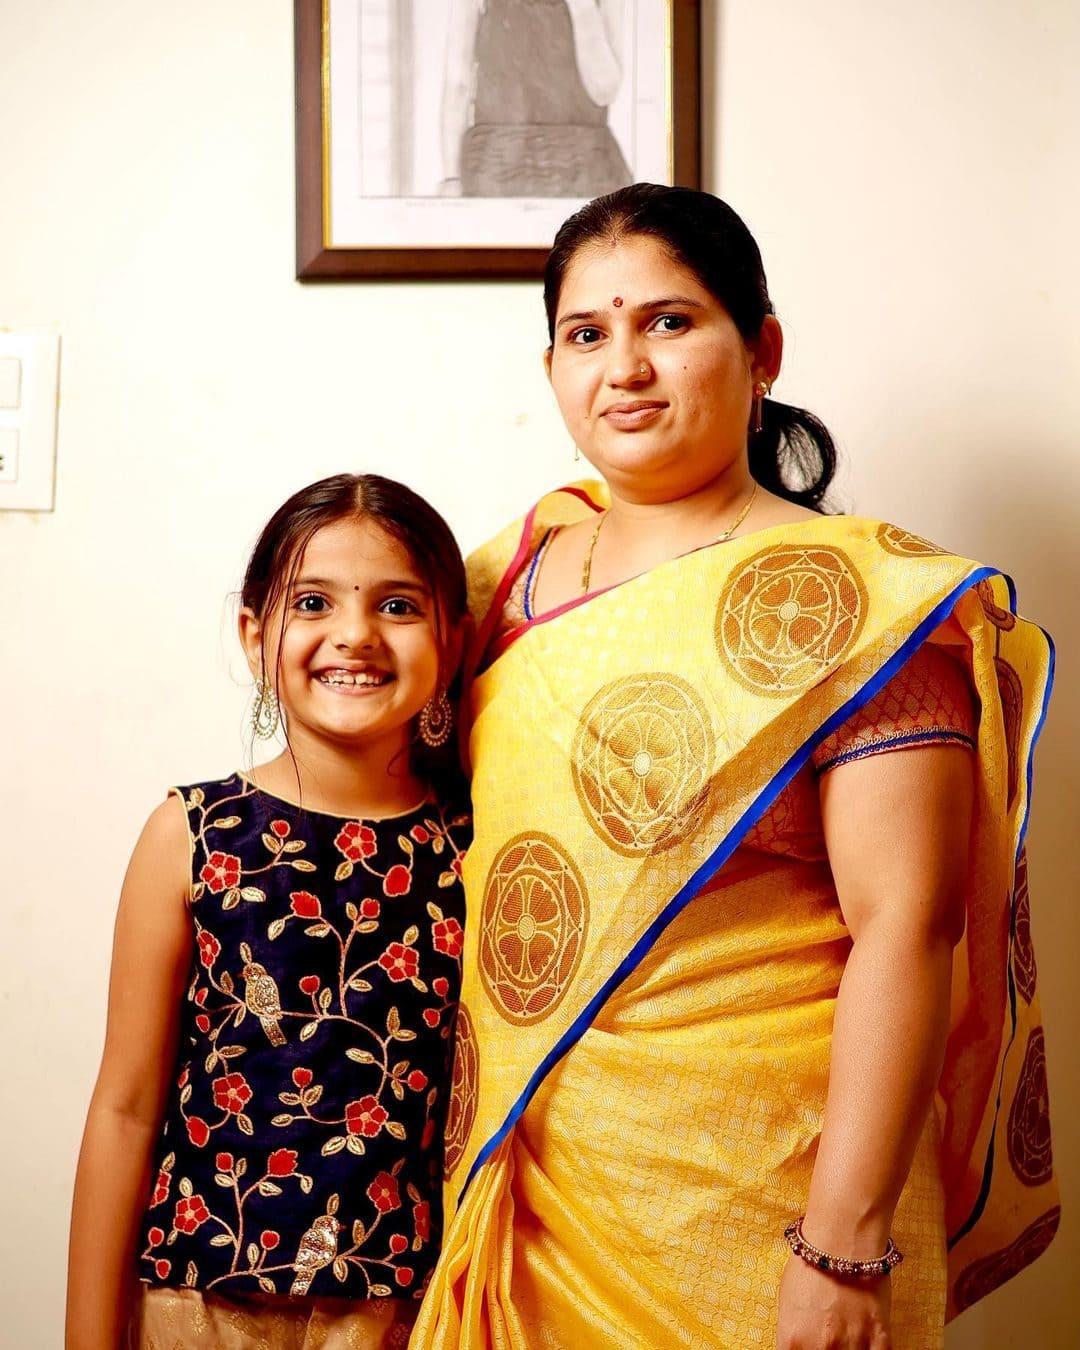 Shivanjali Porje with her mother Shivanjali Porje